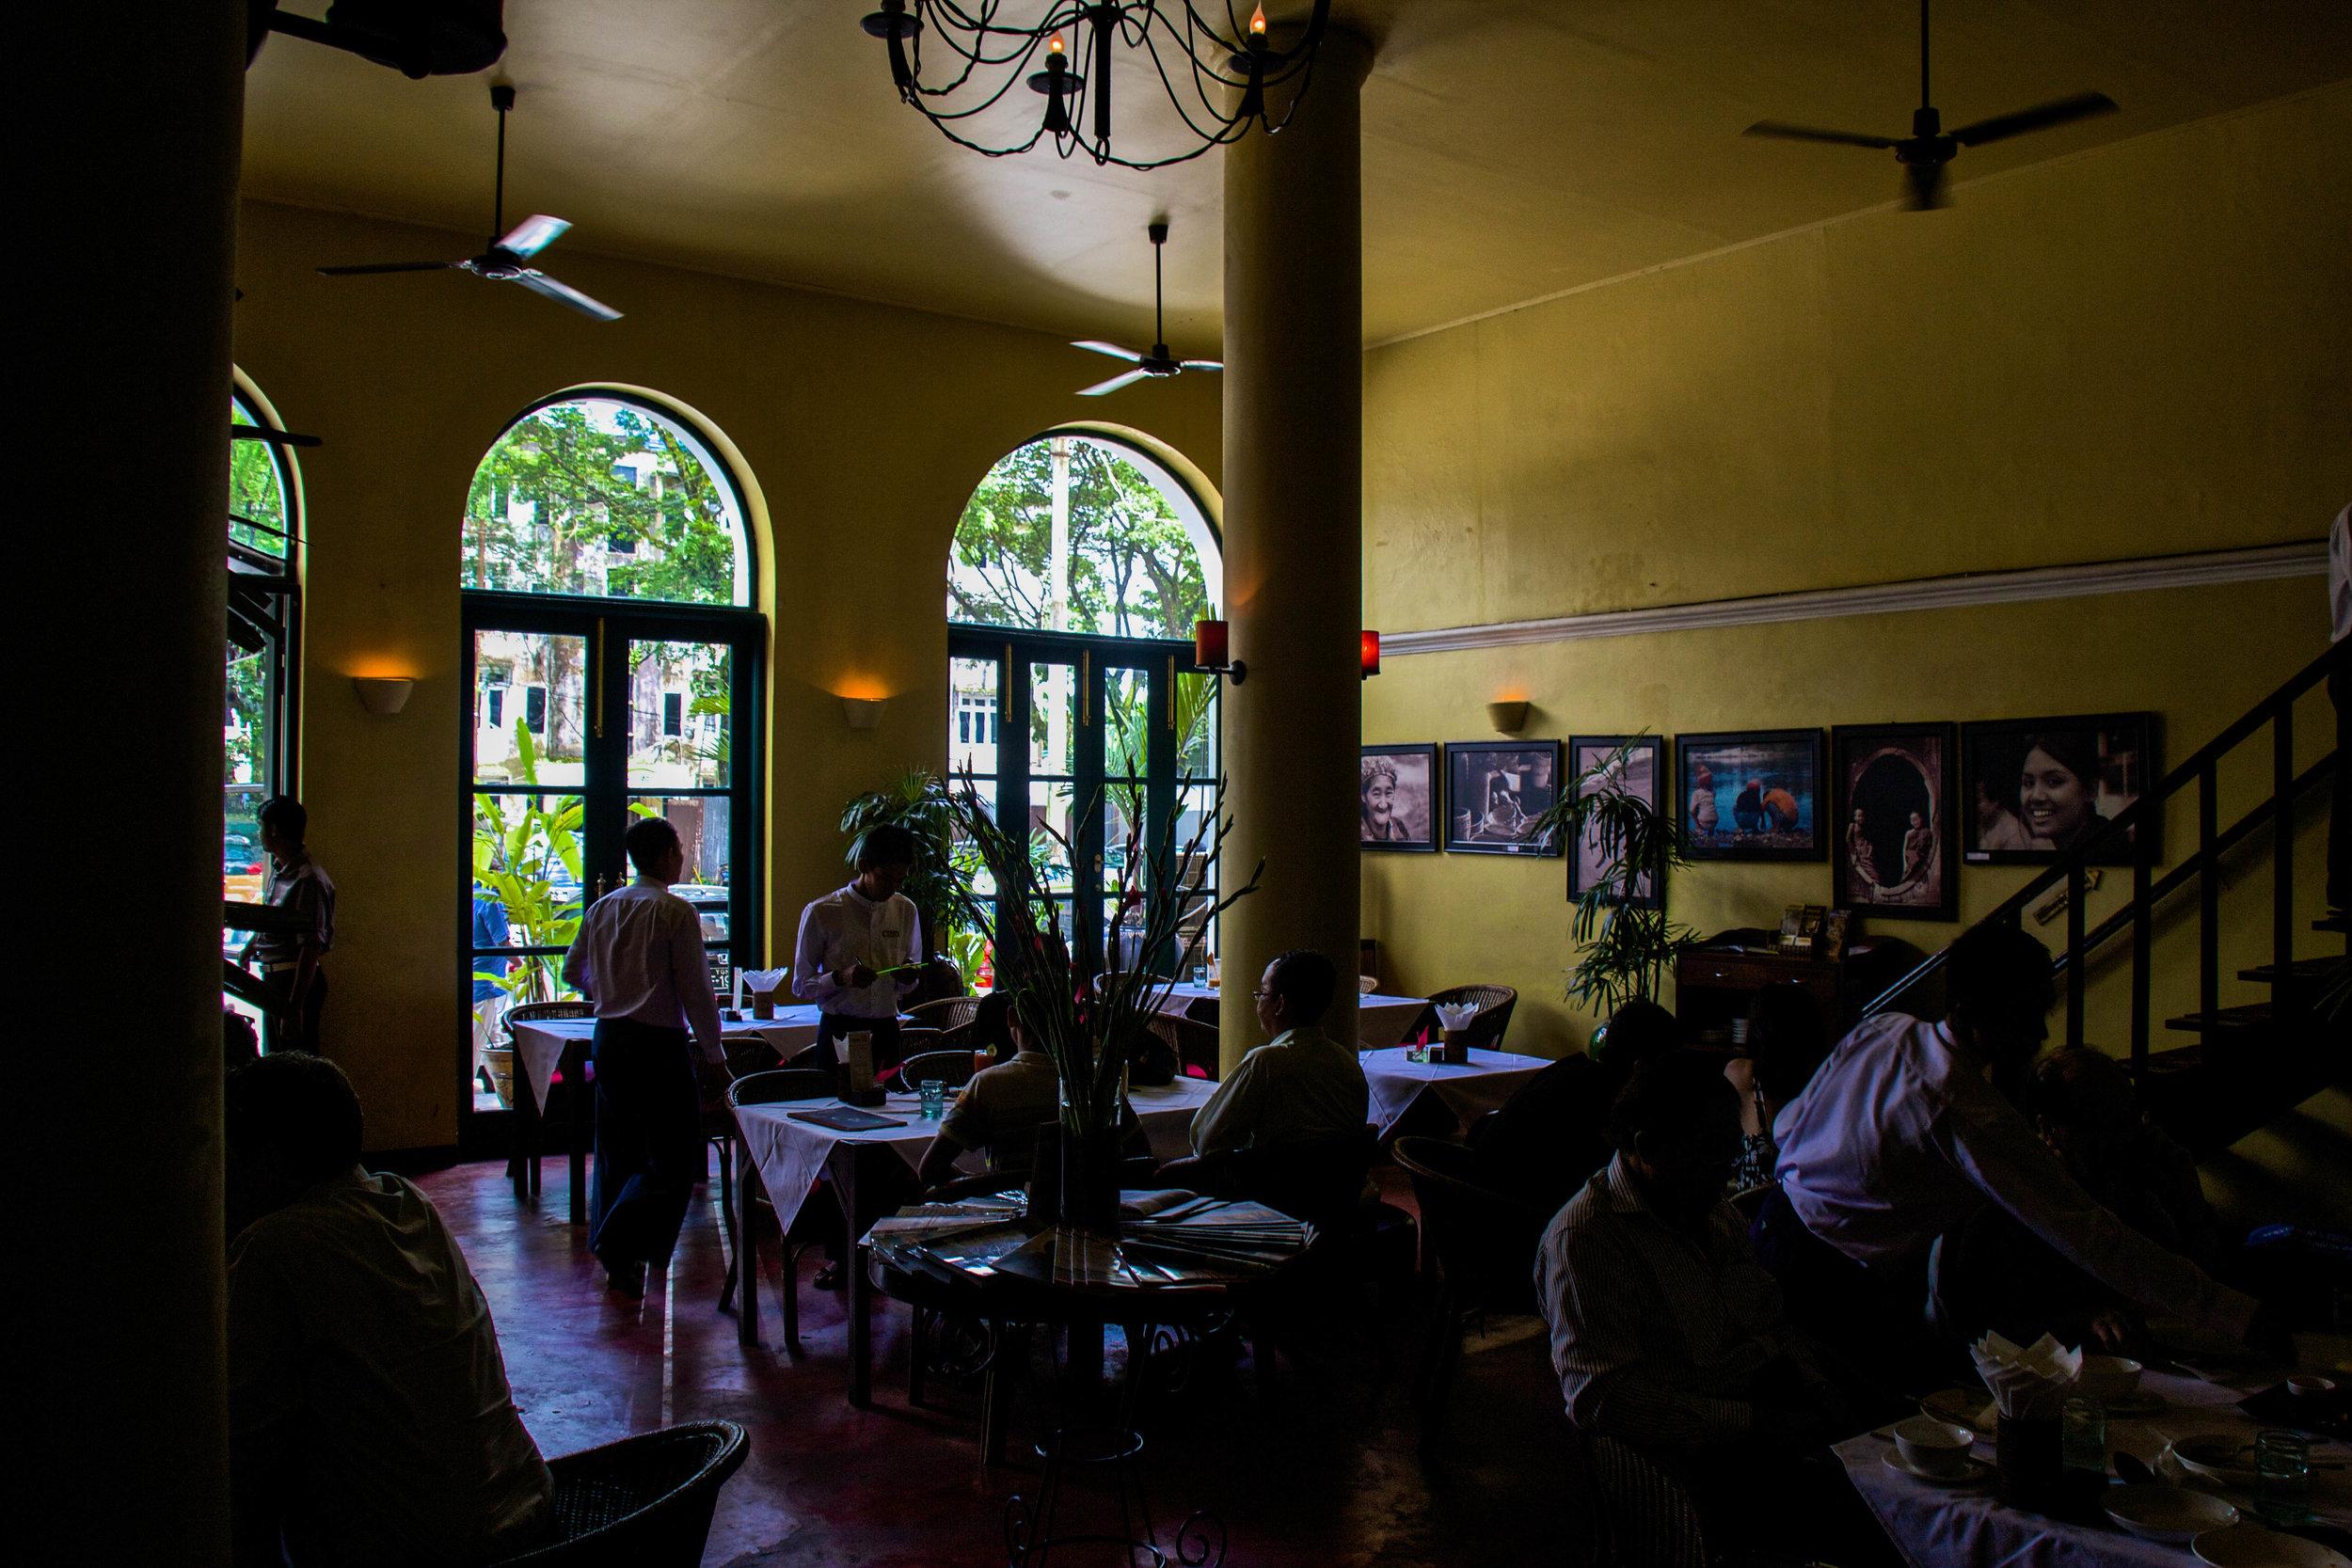 monsoon restaurant rangoon yangon burma myanmar 2-2.jpg